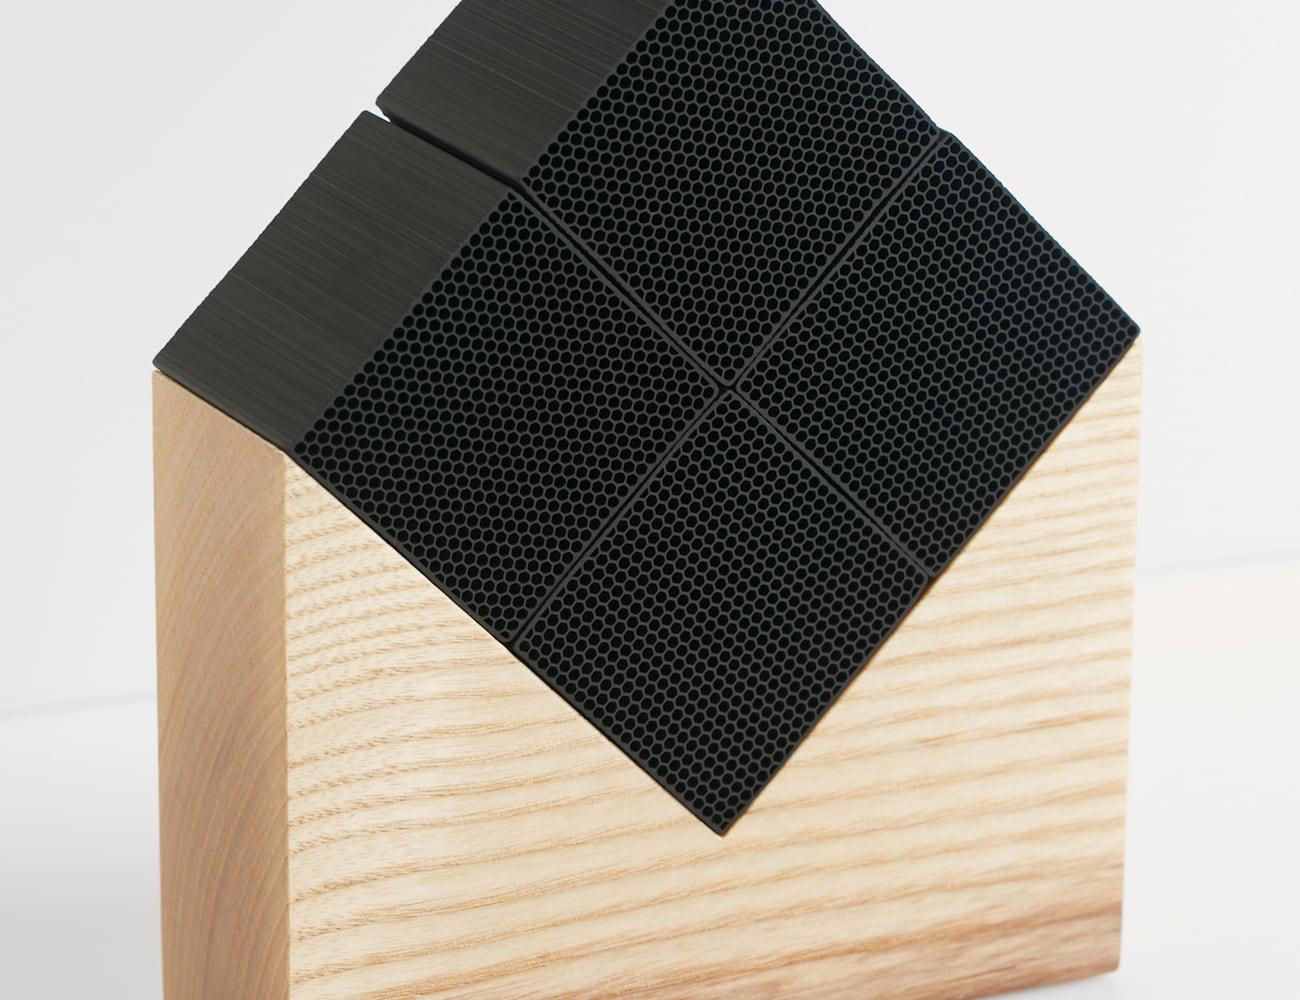 Chikuno Charcoal Deodorizer Cube Set Frillstash